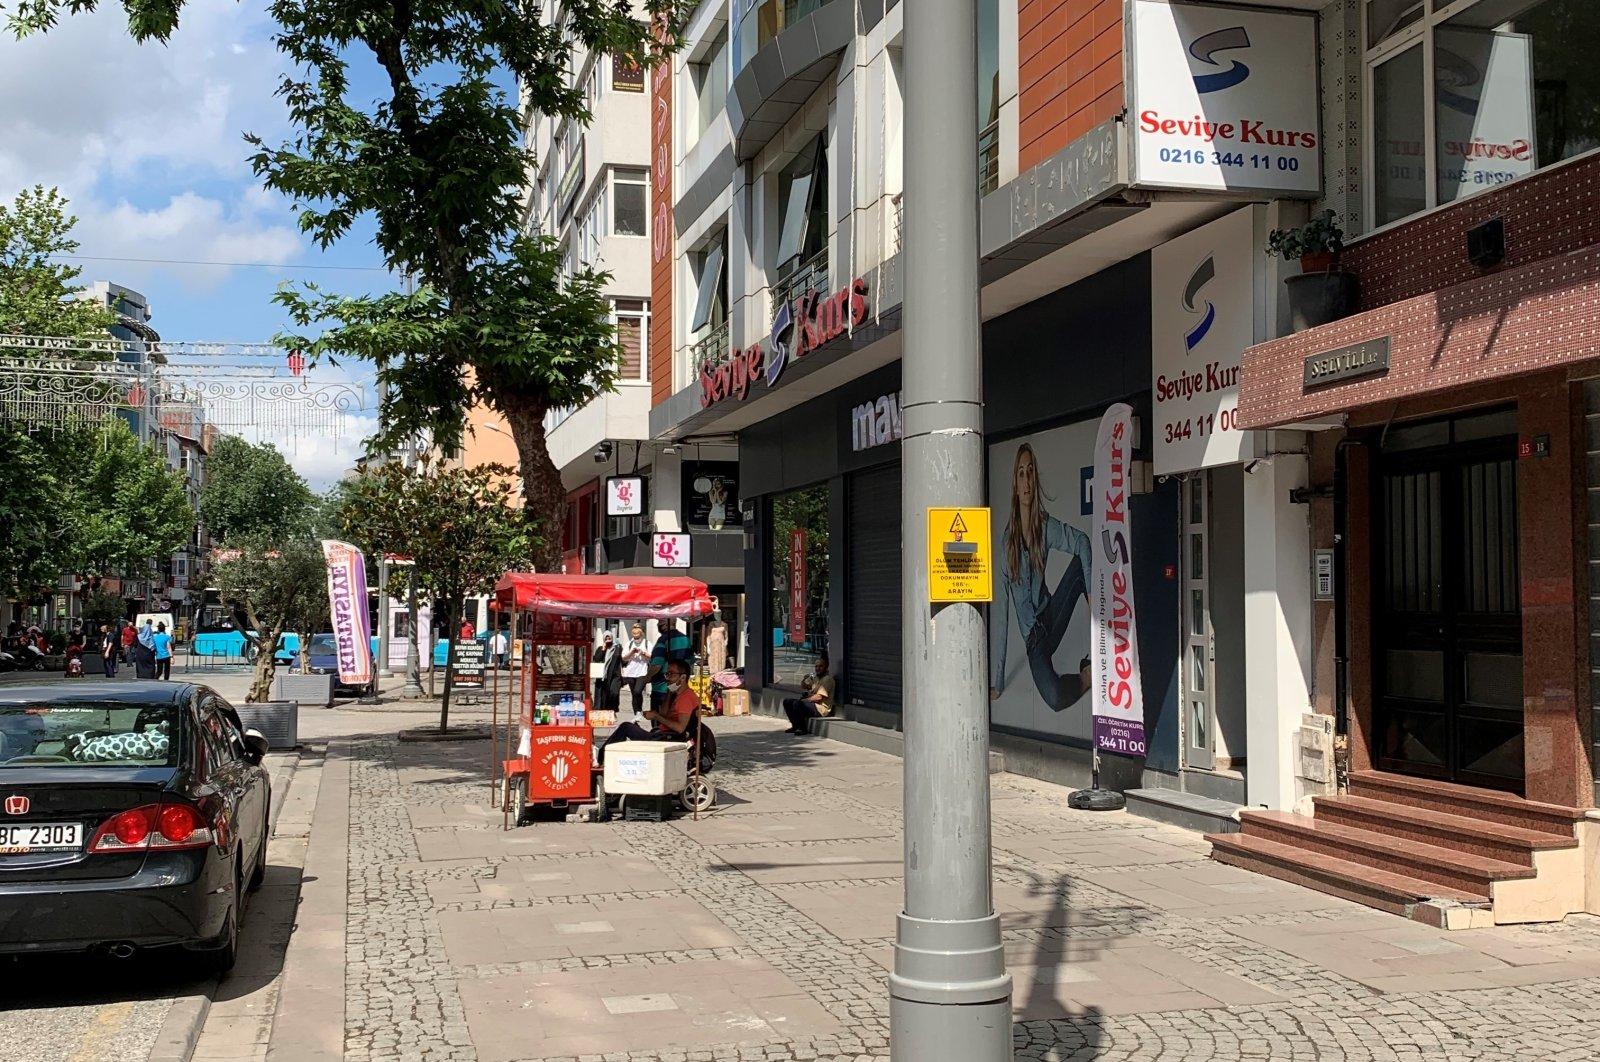 Enerjisa's new system warns about leaks in electric poles, Ümraniye district, Istanbul. (Enerjisa via AA)